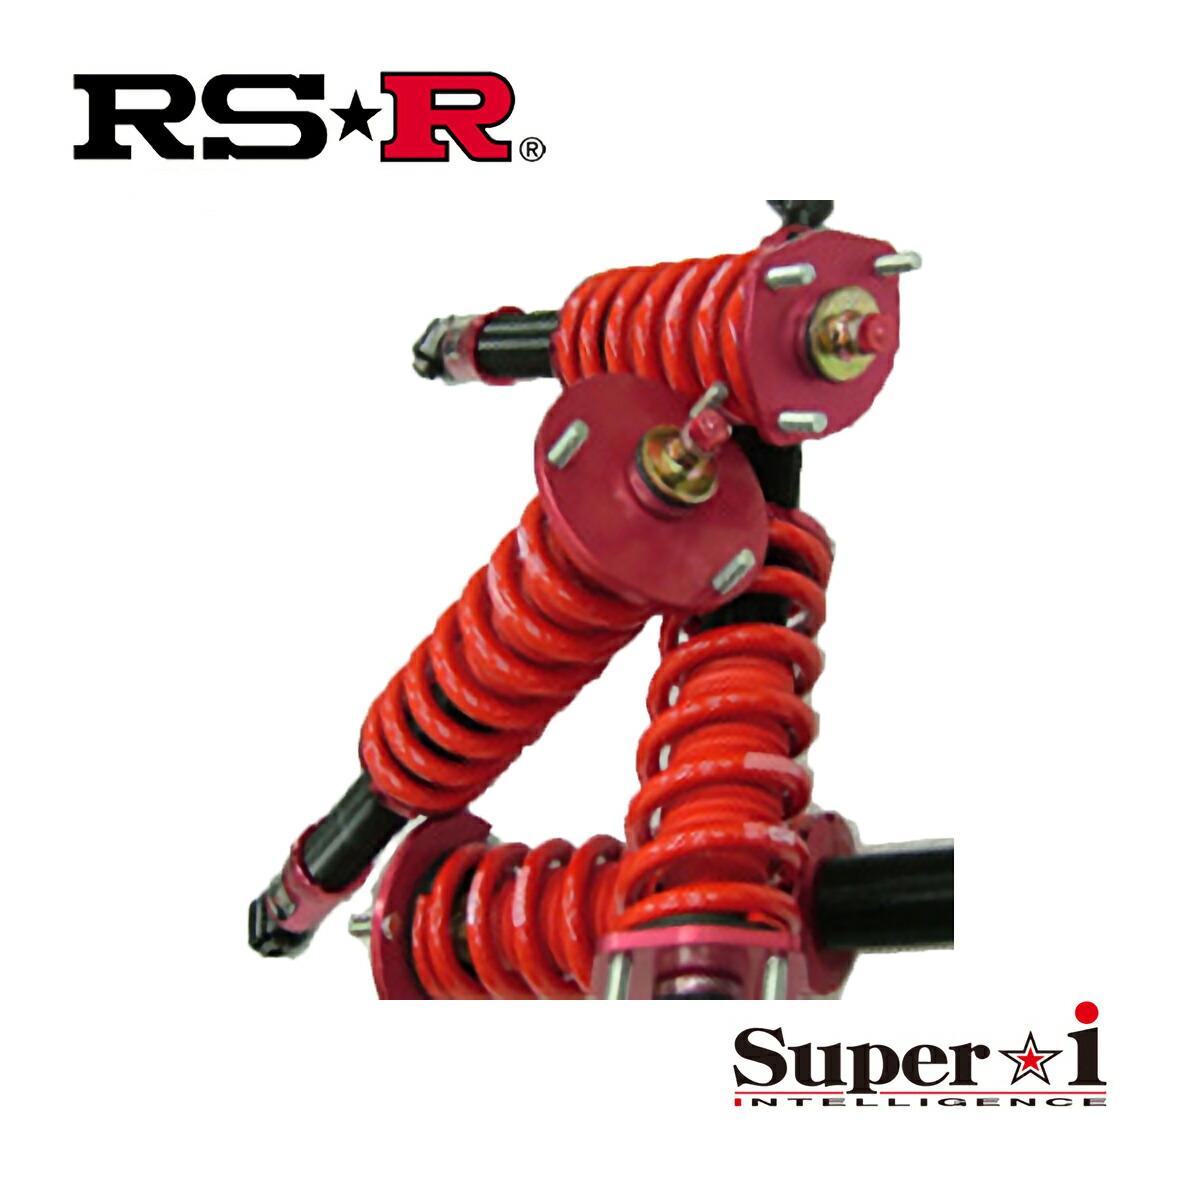 RS★R アルファードハイブリッド ATH20W 車高調 推奨仕様商品コード:SIT859M RSR 条件付き送料無料